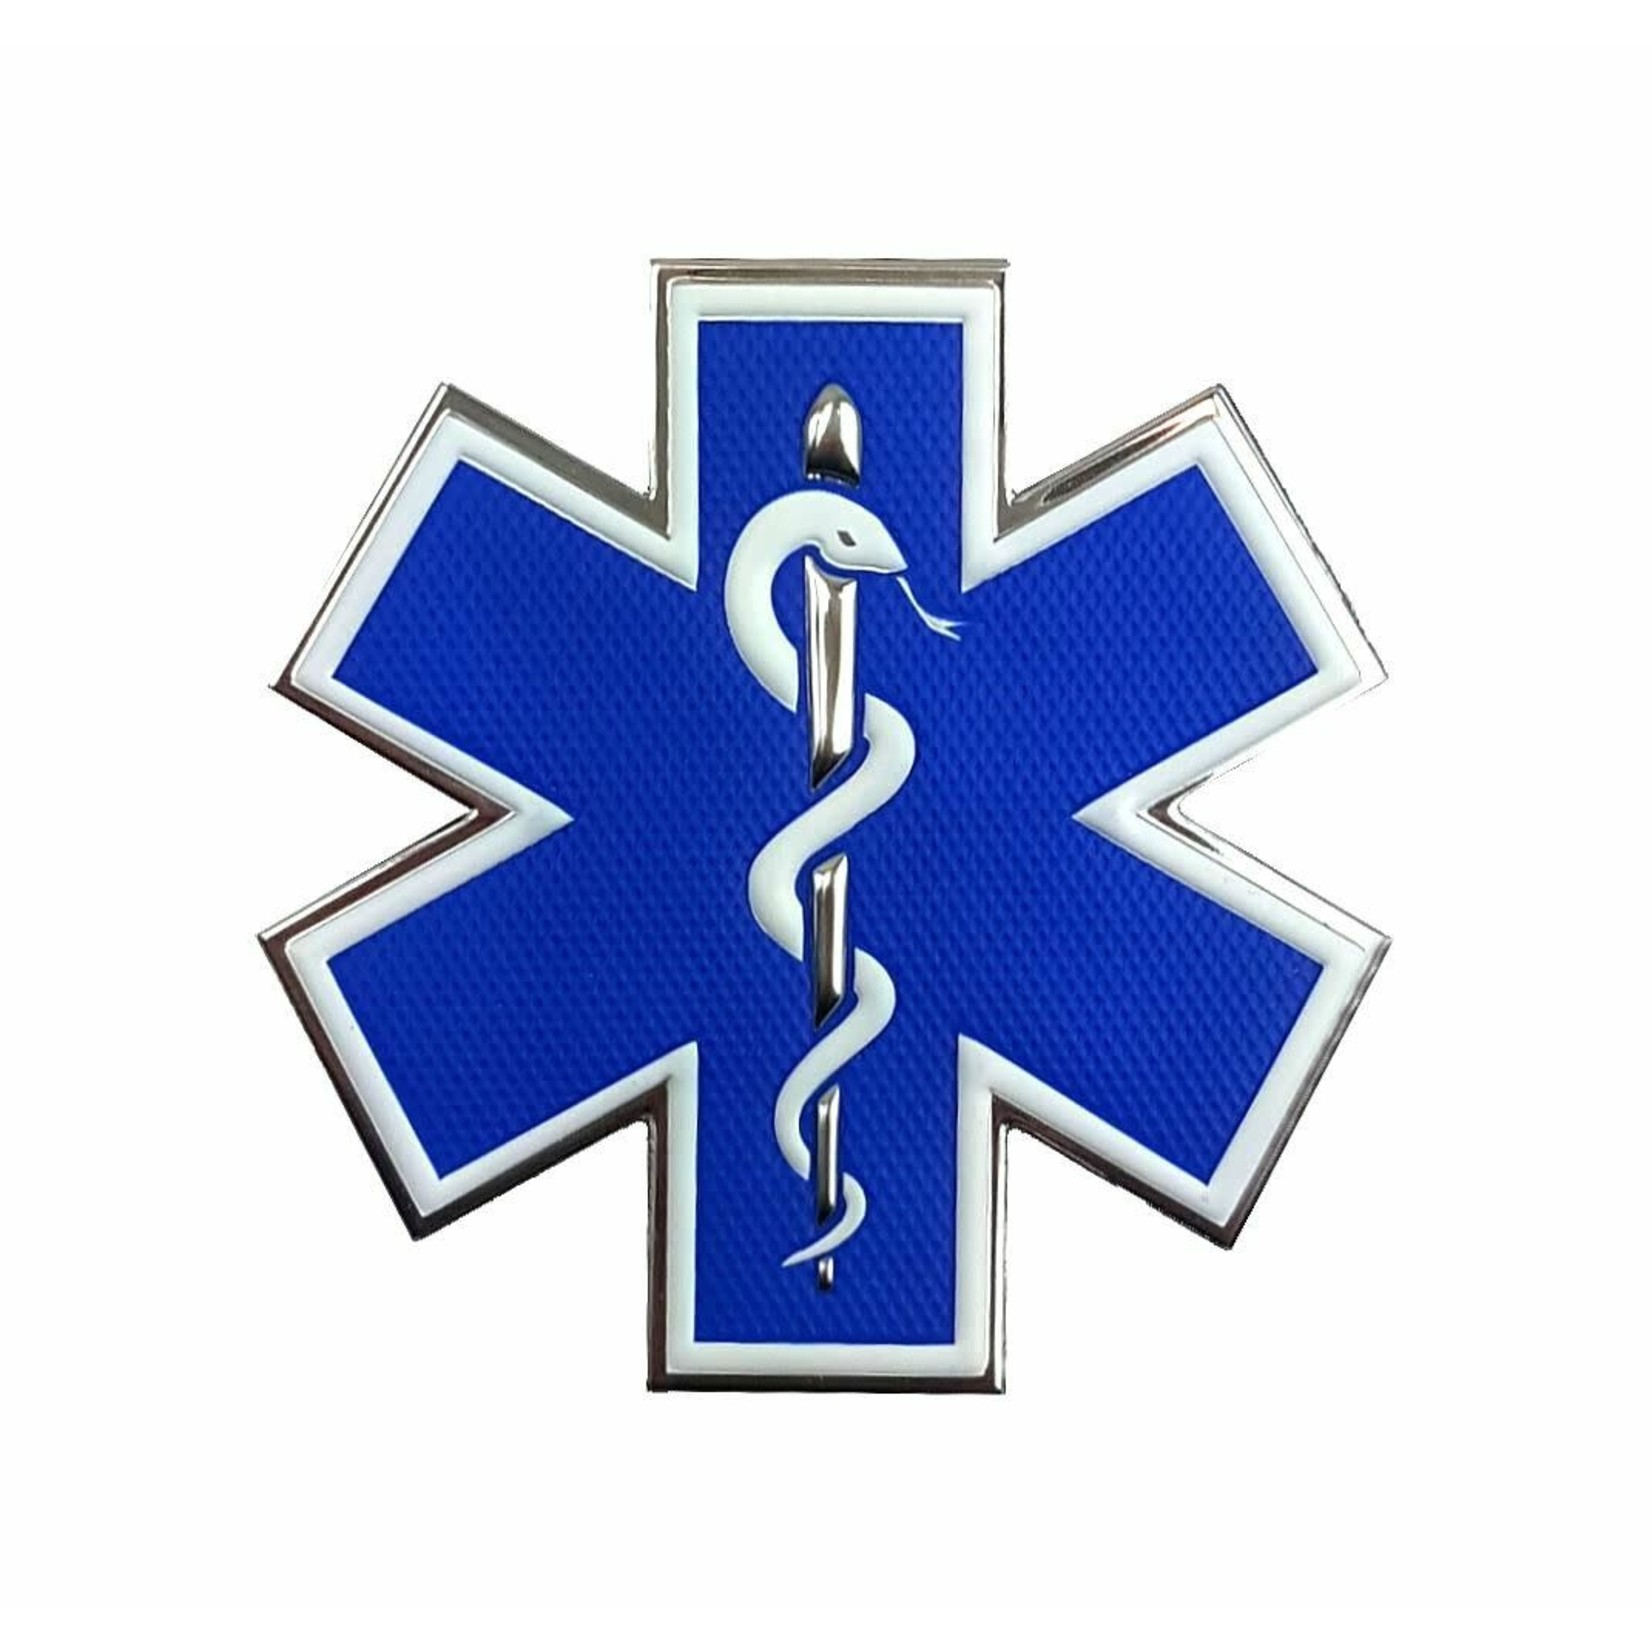 Klarus Tactical Innovations Chrome Morale Patch -Medical Responder